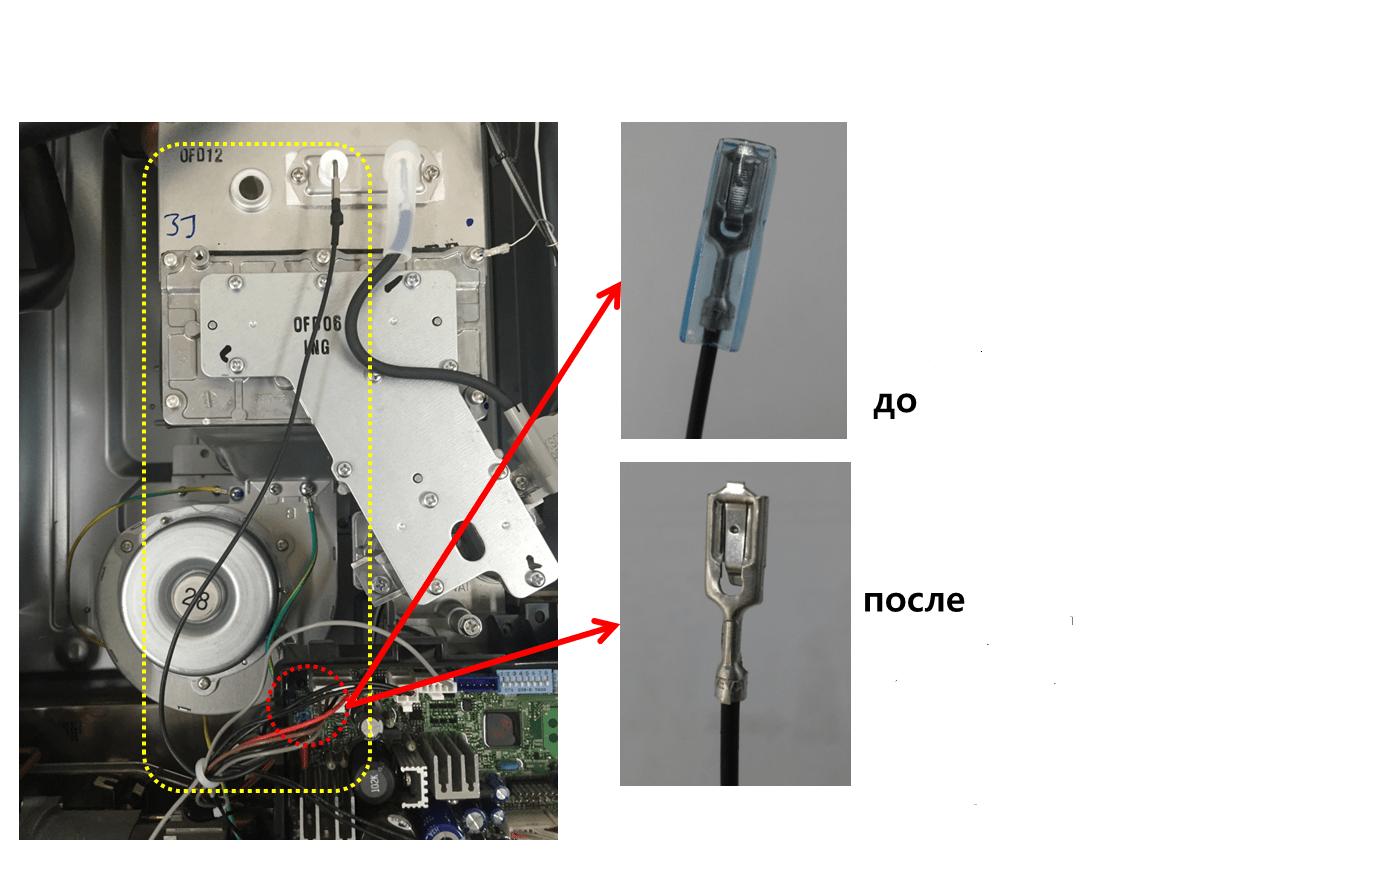 контакта провода датчика ионизации